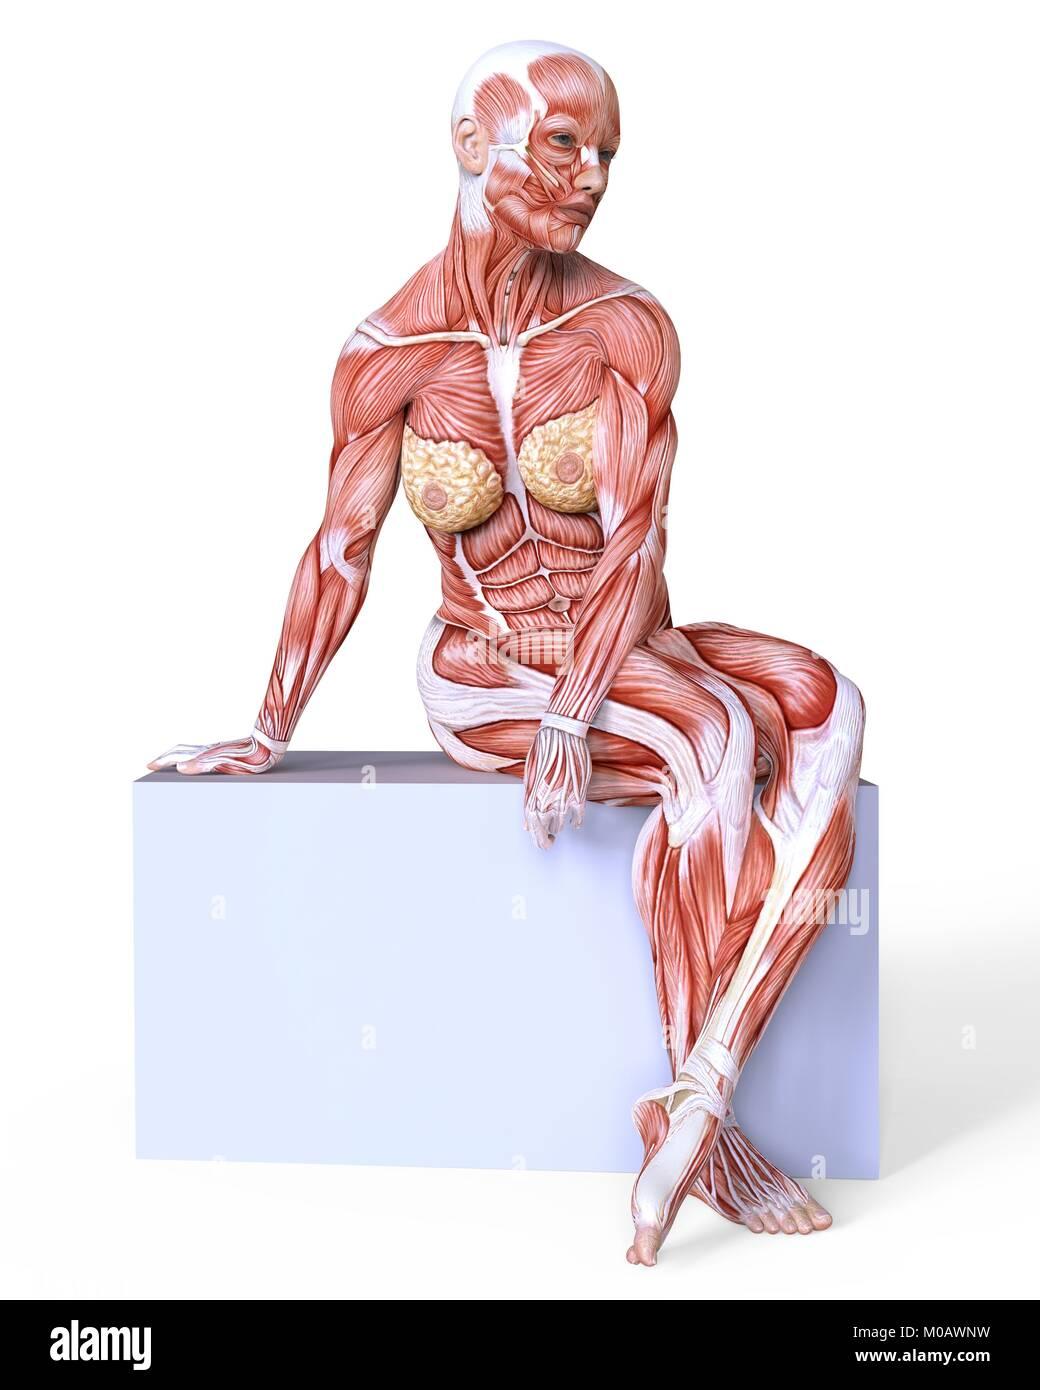 Female Body Muscles Illustration On Stock Photos & Female Body ...